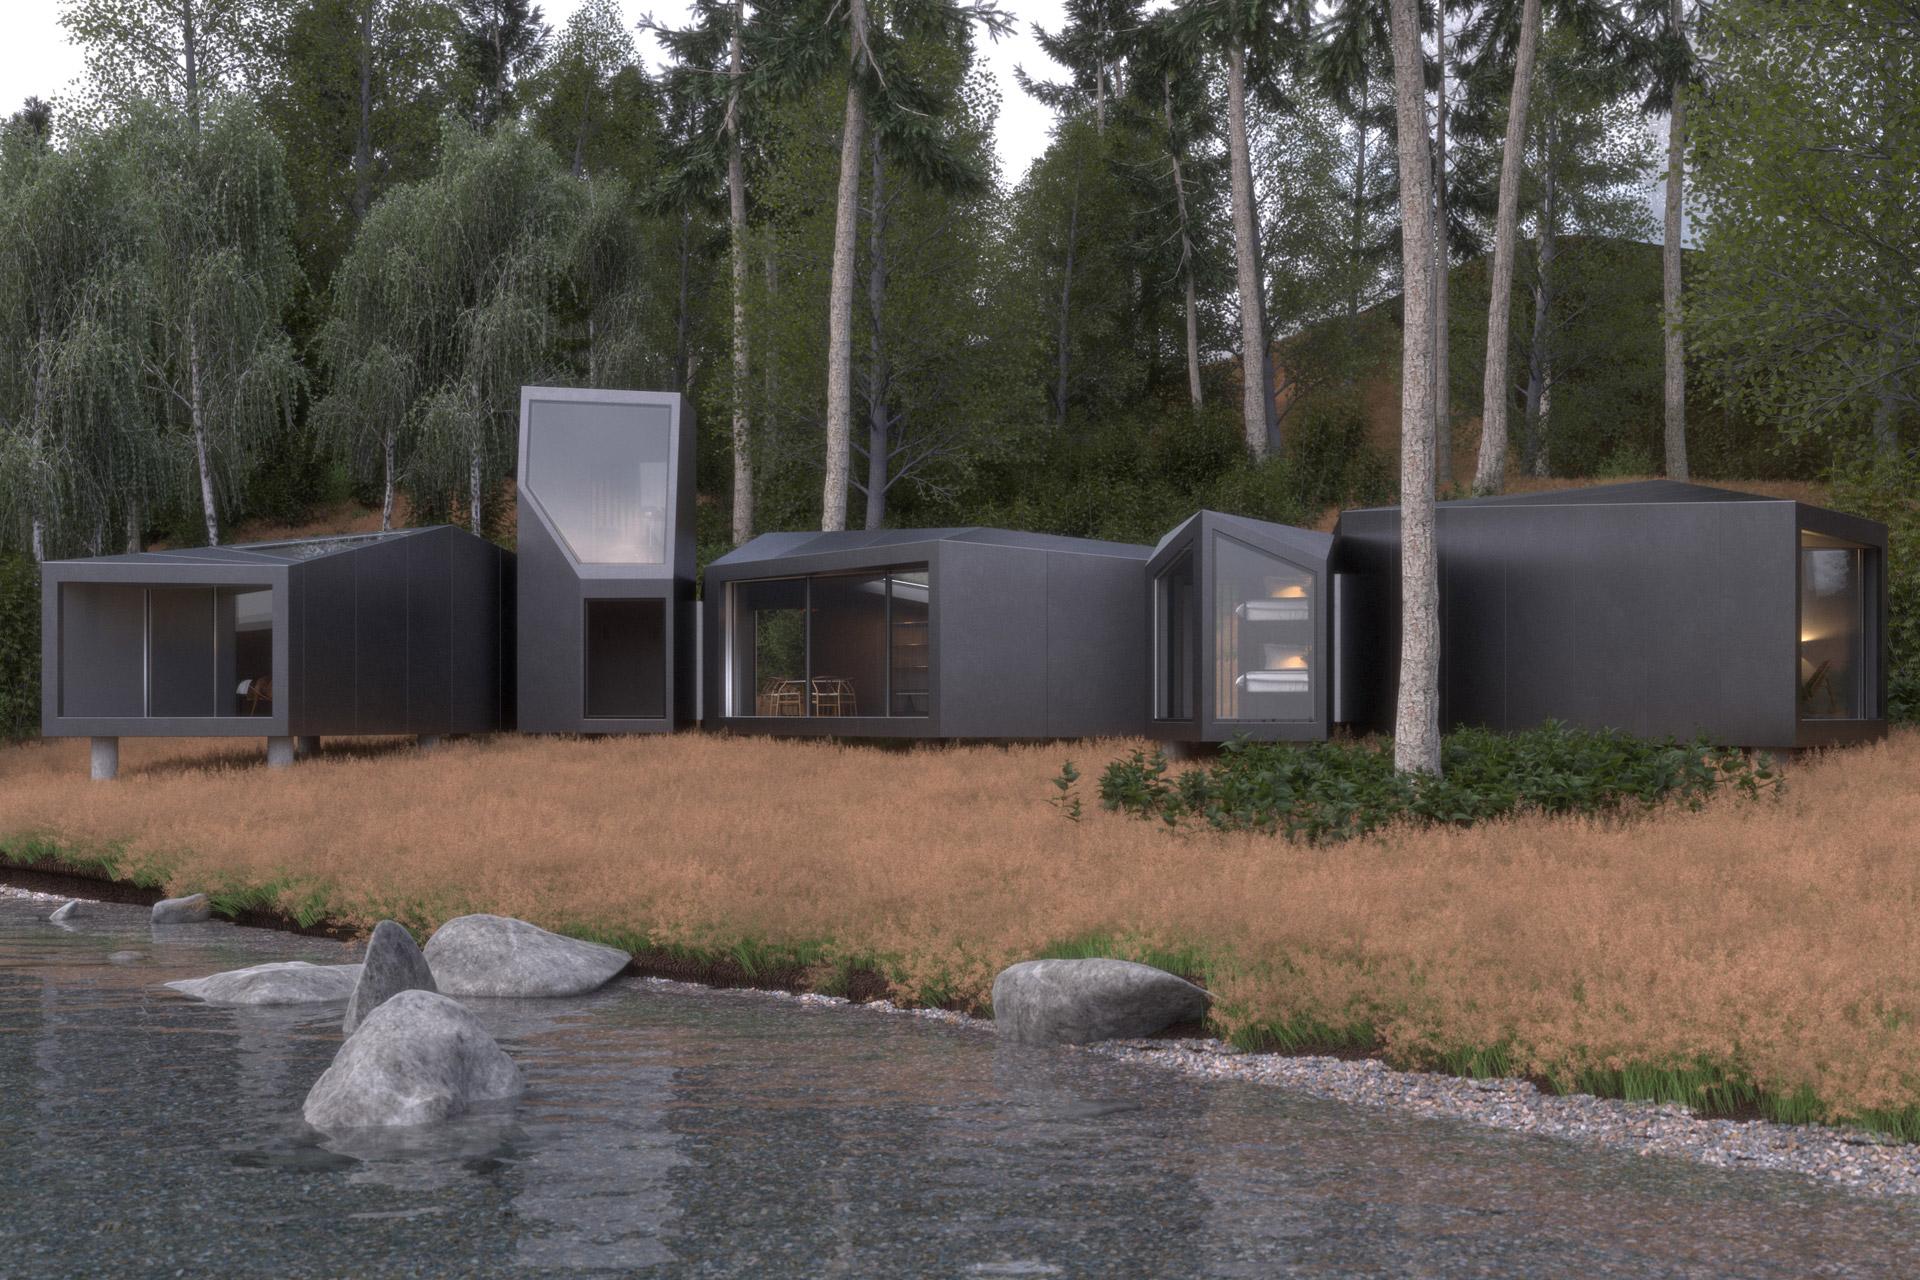 Tiny Homes, Prefab, Modular & Unusual Homes cover image